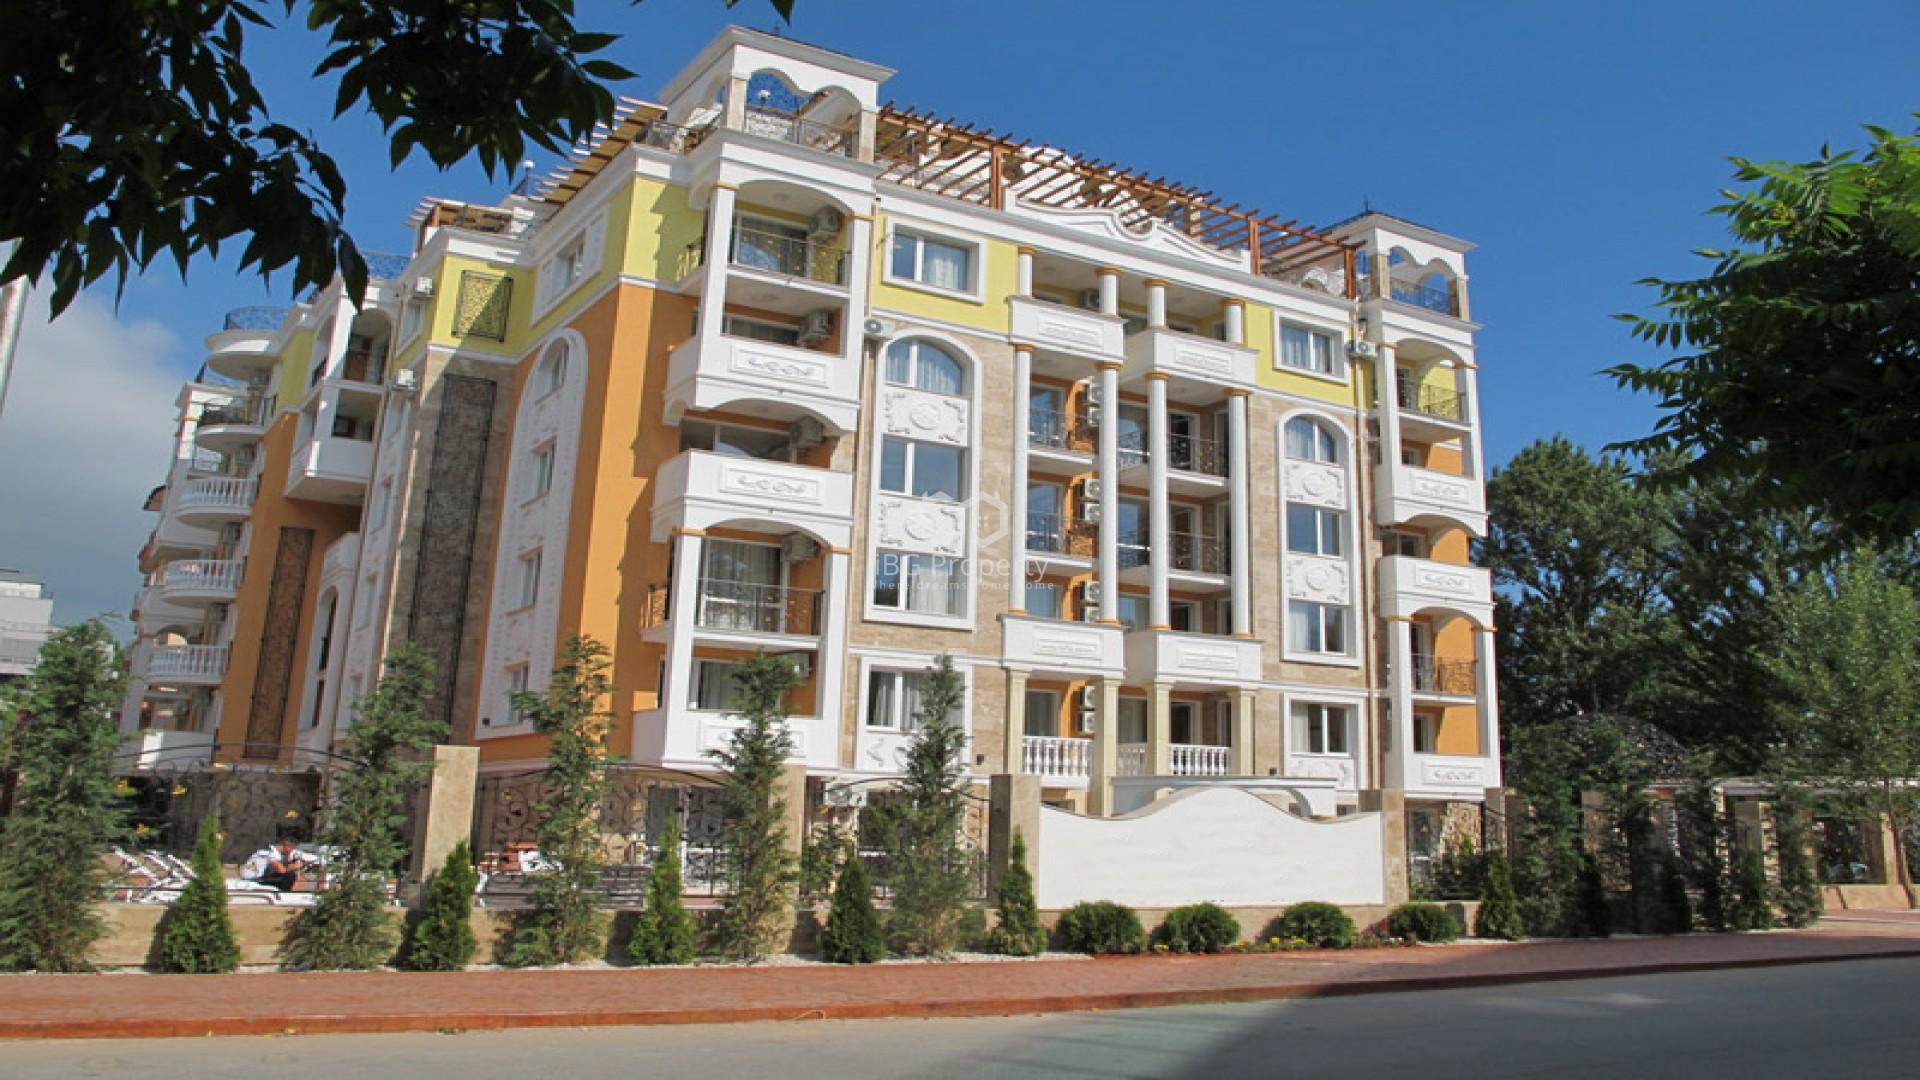 Tристаен апартамент Слънчев Бряг 100 m2